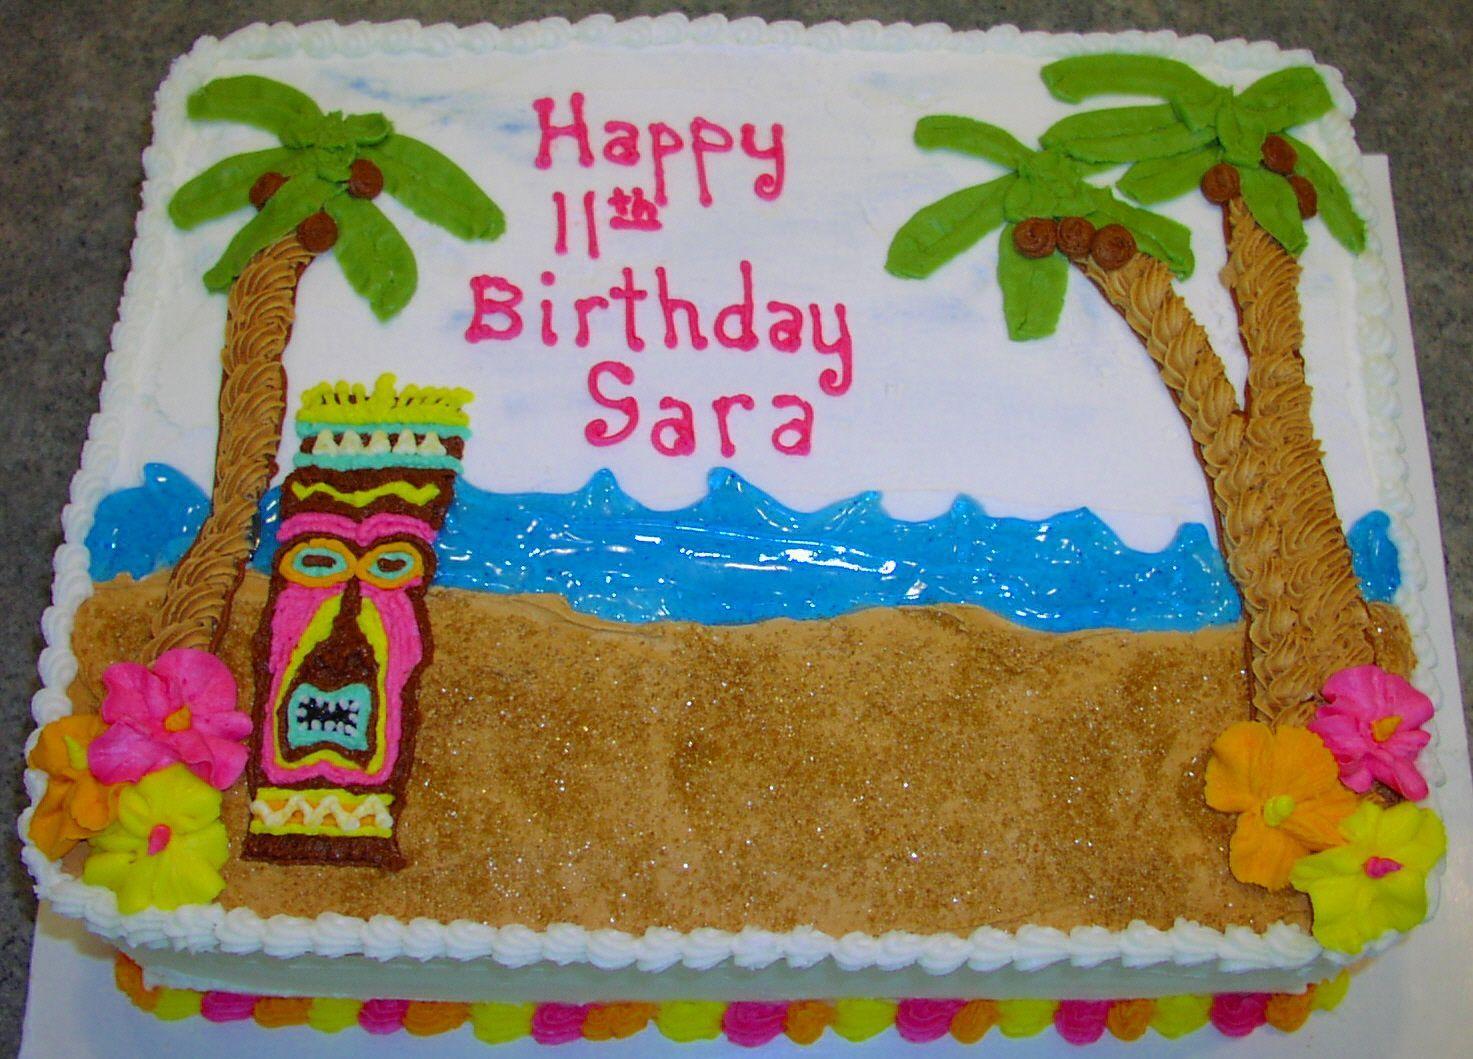 66 Year Old Birthday Themes